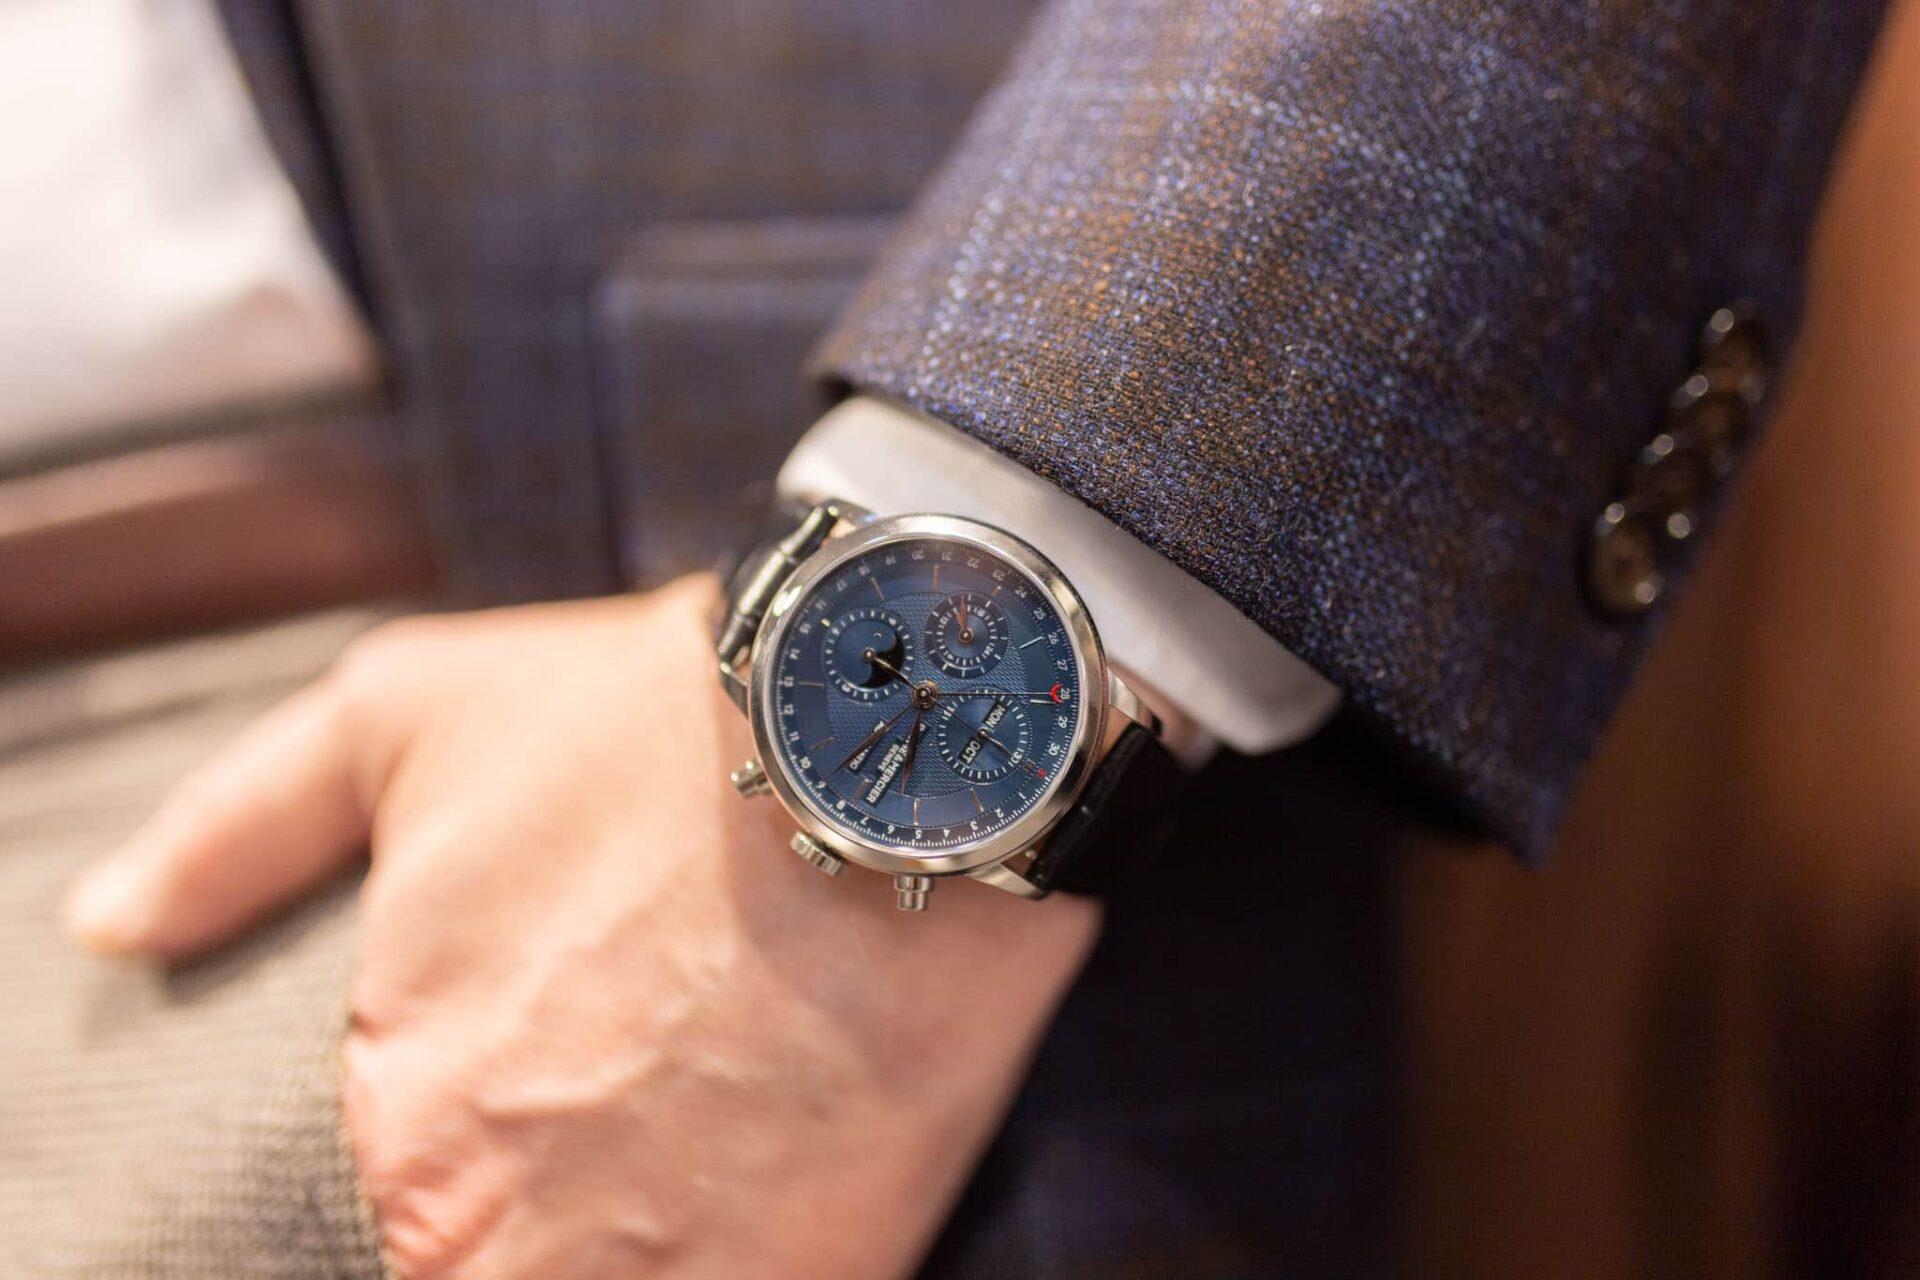 A stylish dress chronograph - Baume & Mercier Classima 10484